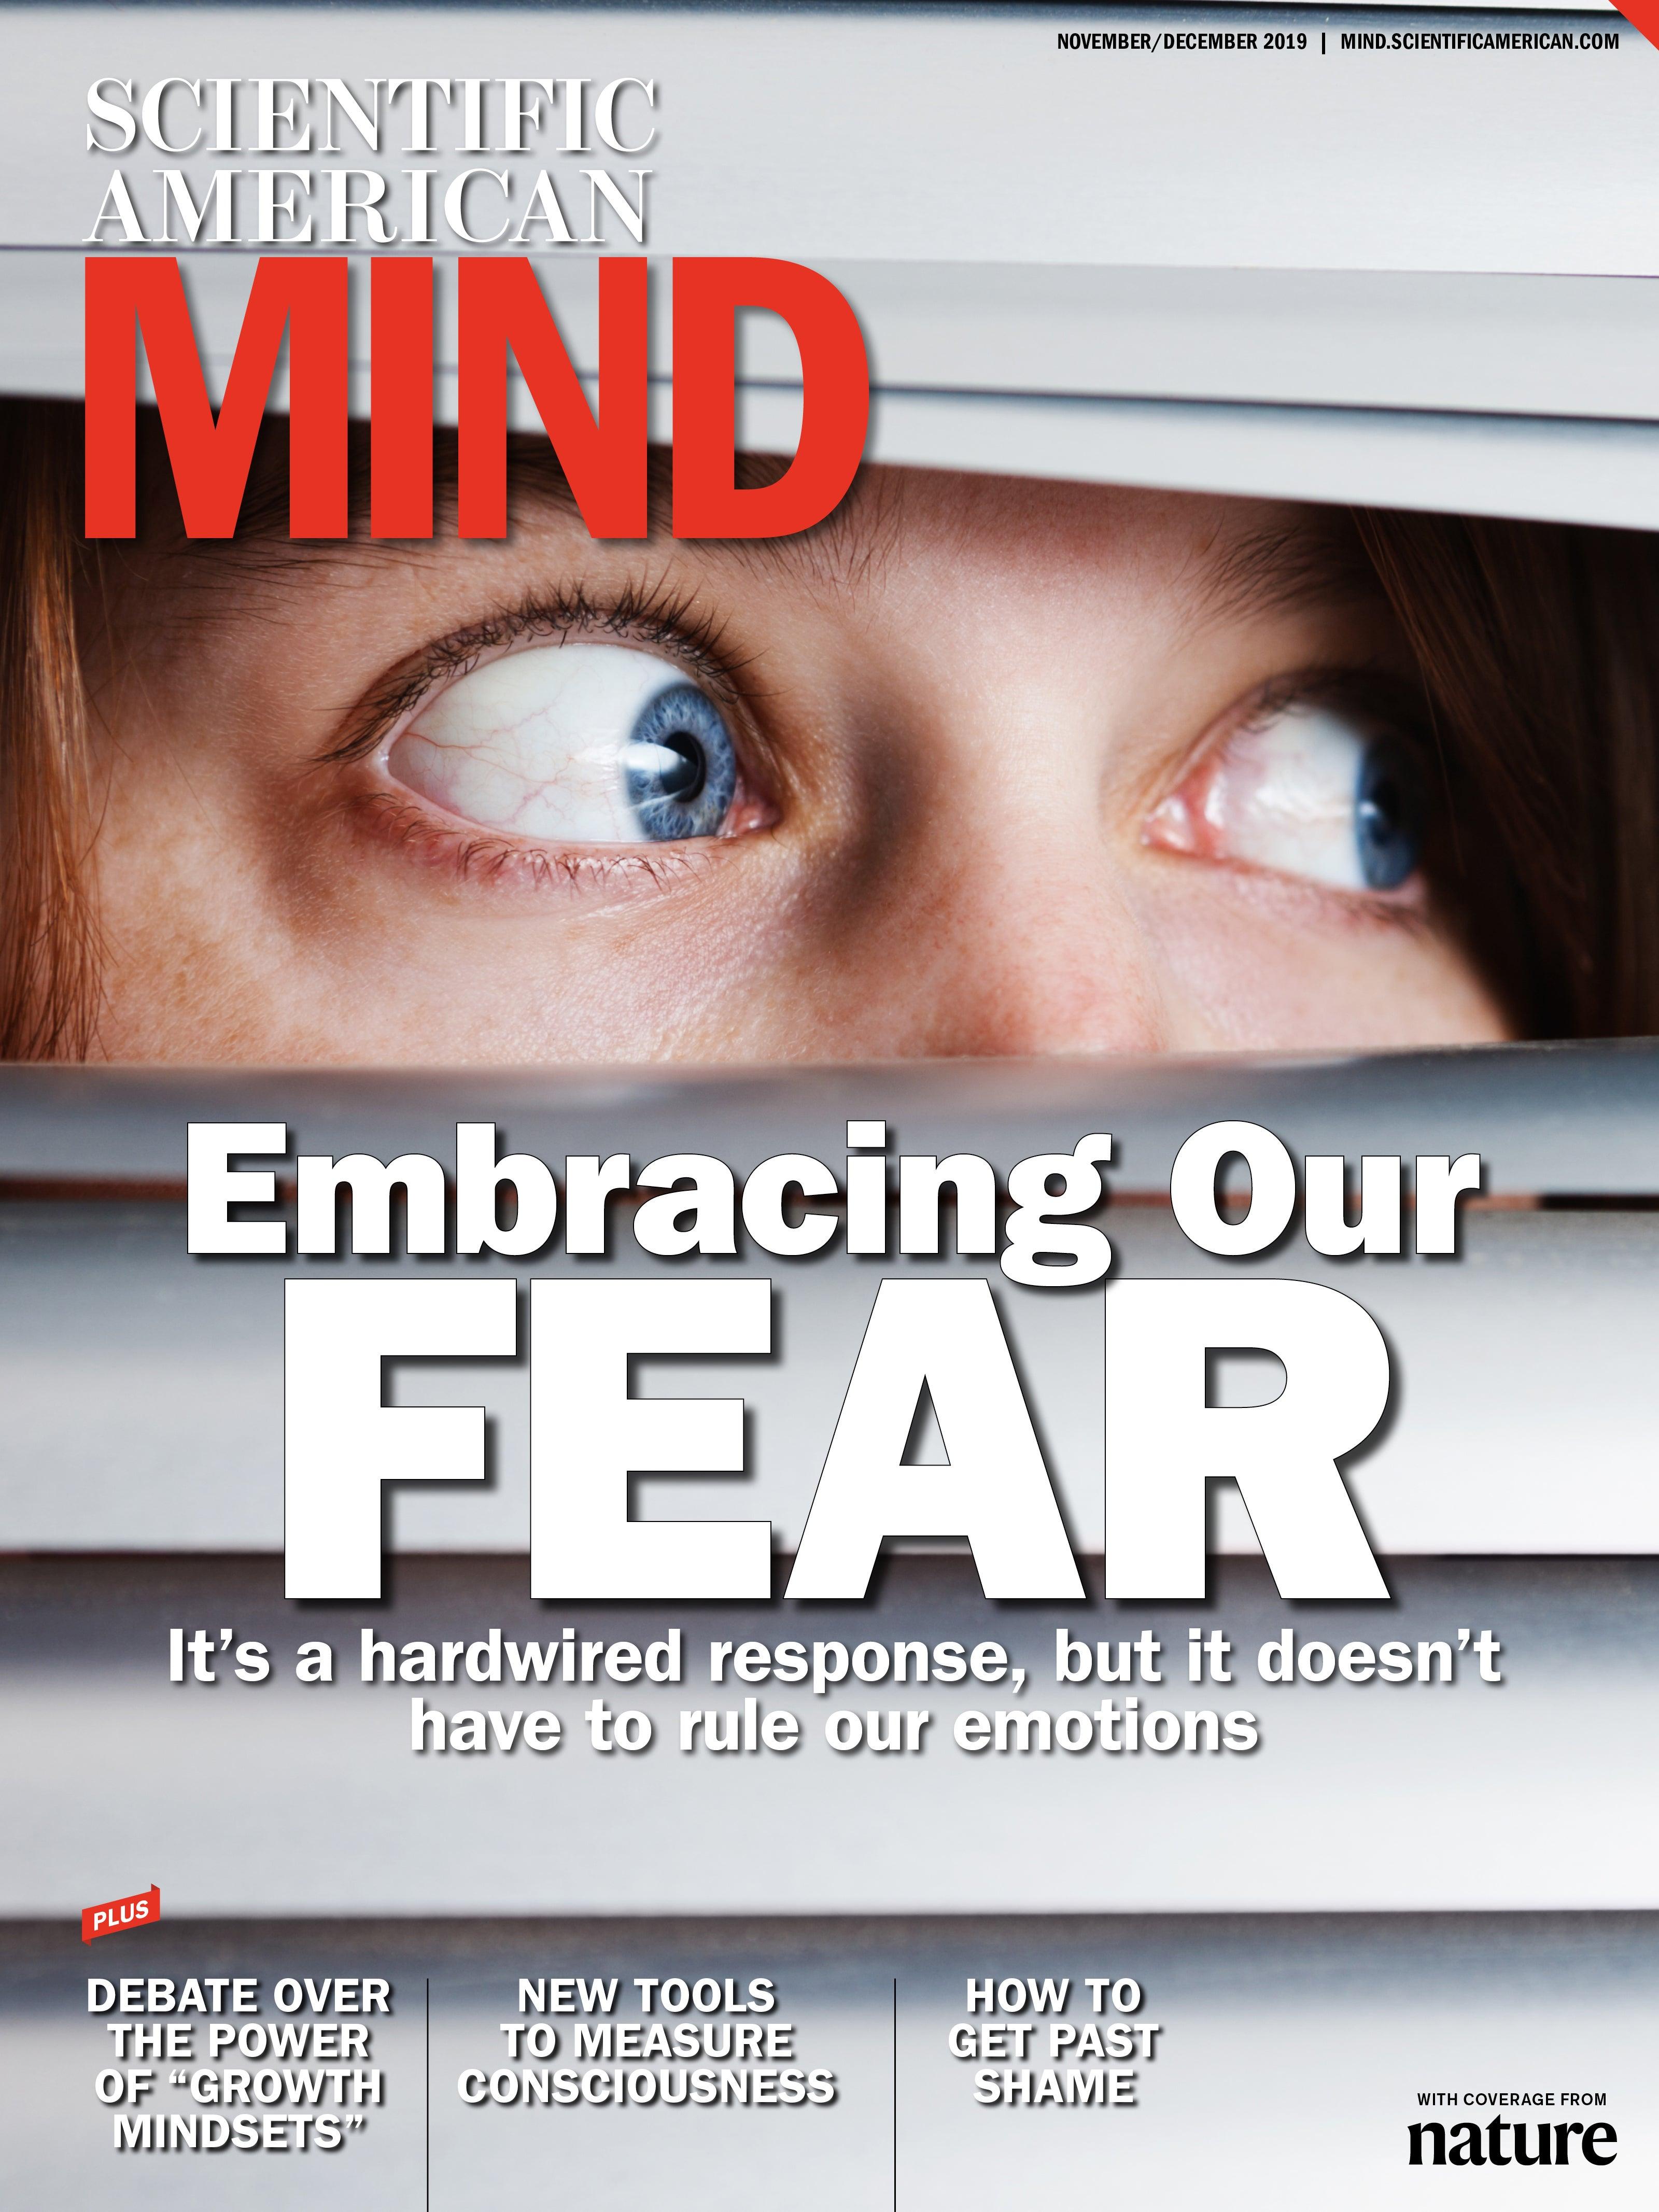 Scientific American Mind, Volume 30, Issue 6